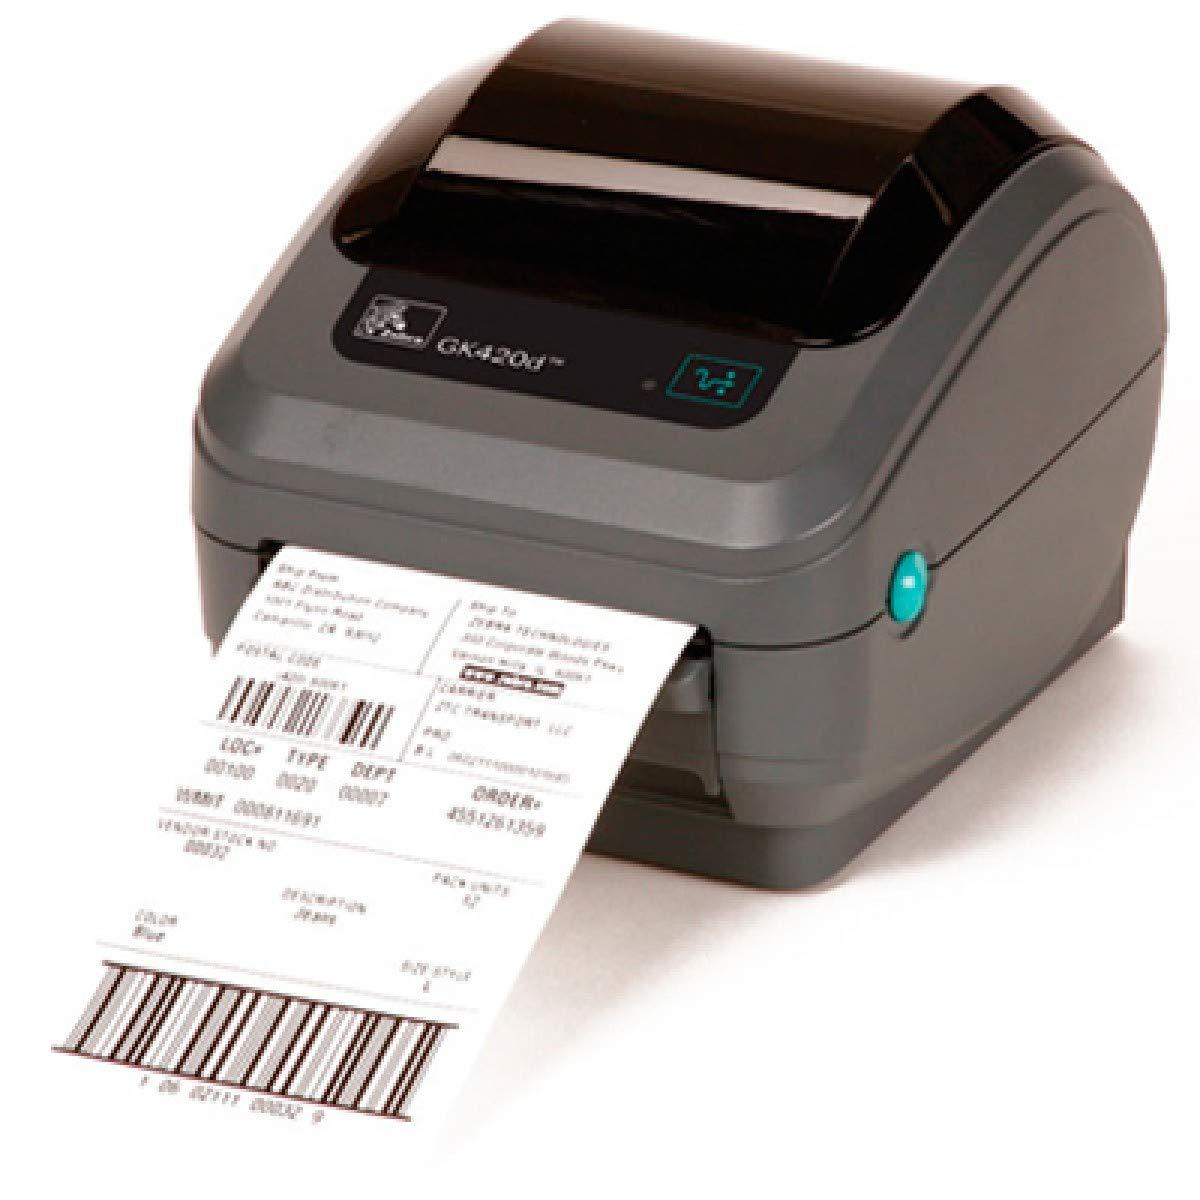 Etiquetas T/érmicas Directas 100x150mm Adhesivas para Transporte Packer PRO 334 Etiquetas x Rollo